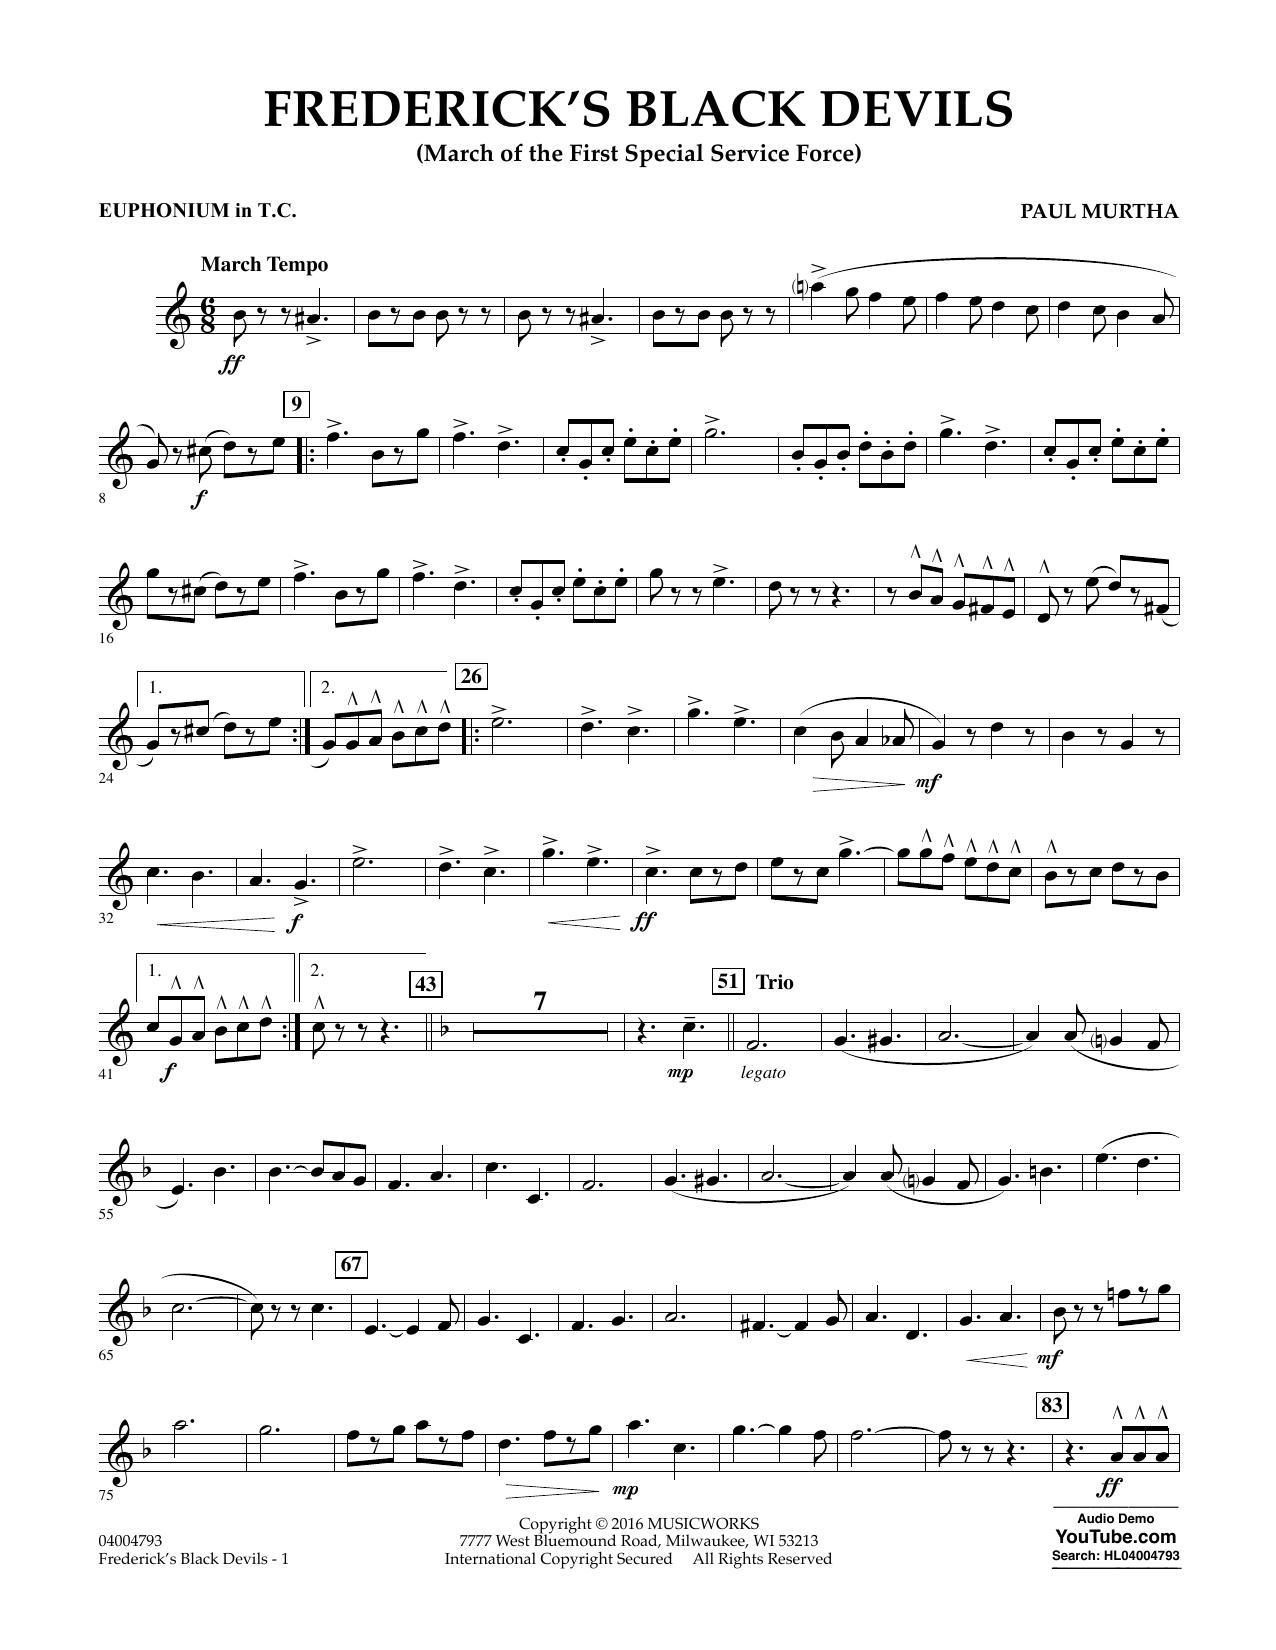 Frederick's Black Devils - Euphonium in Treble Clef (Concert Band)